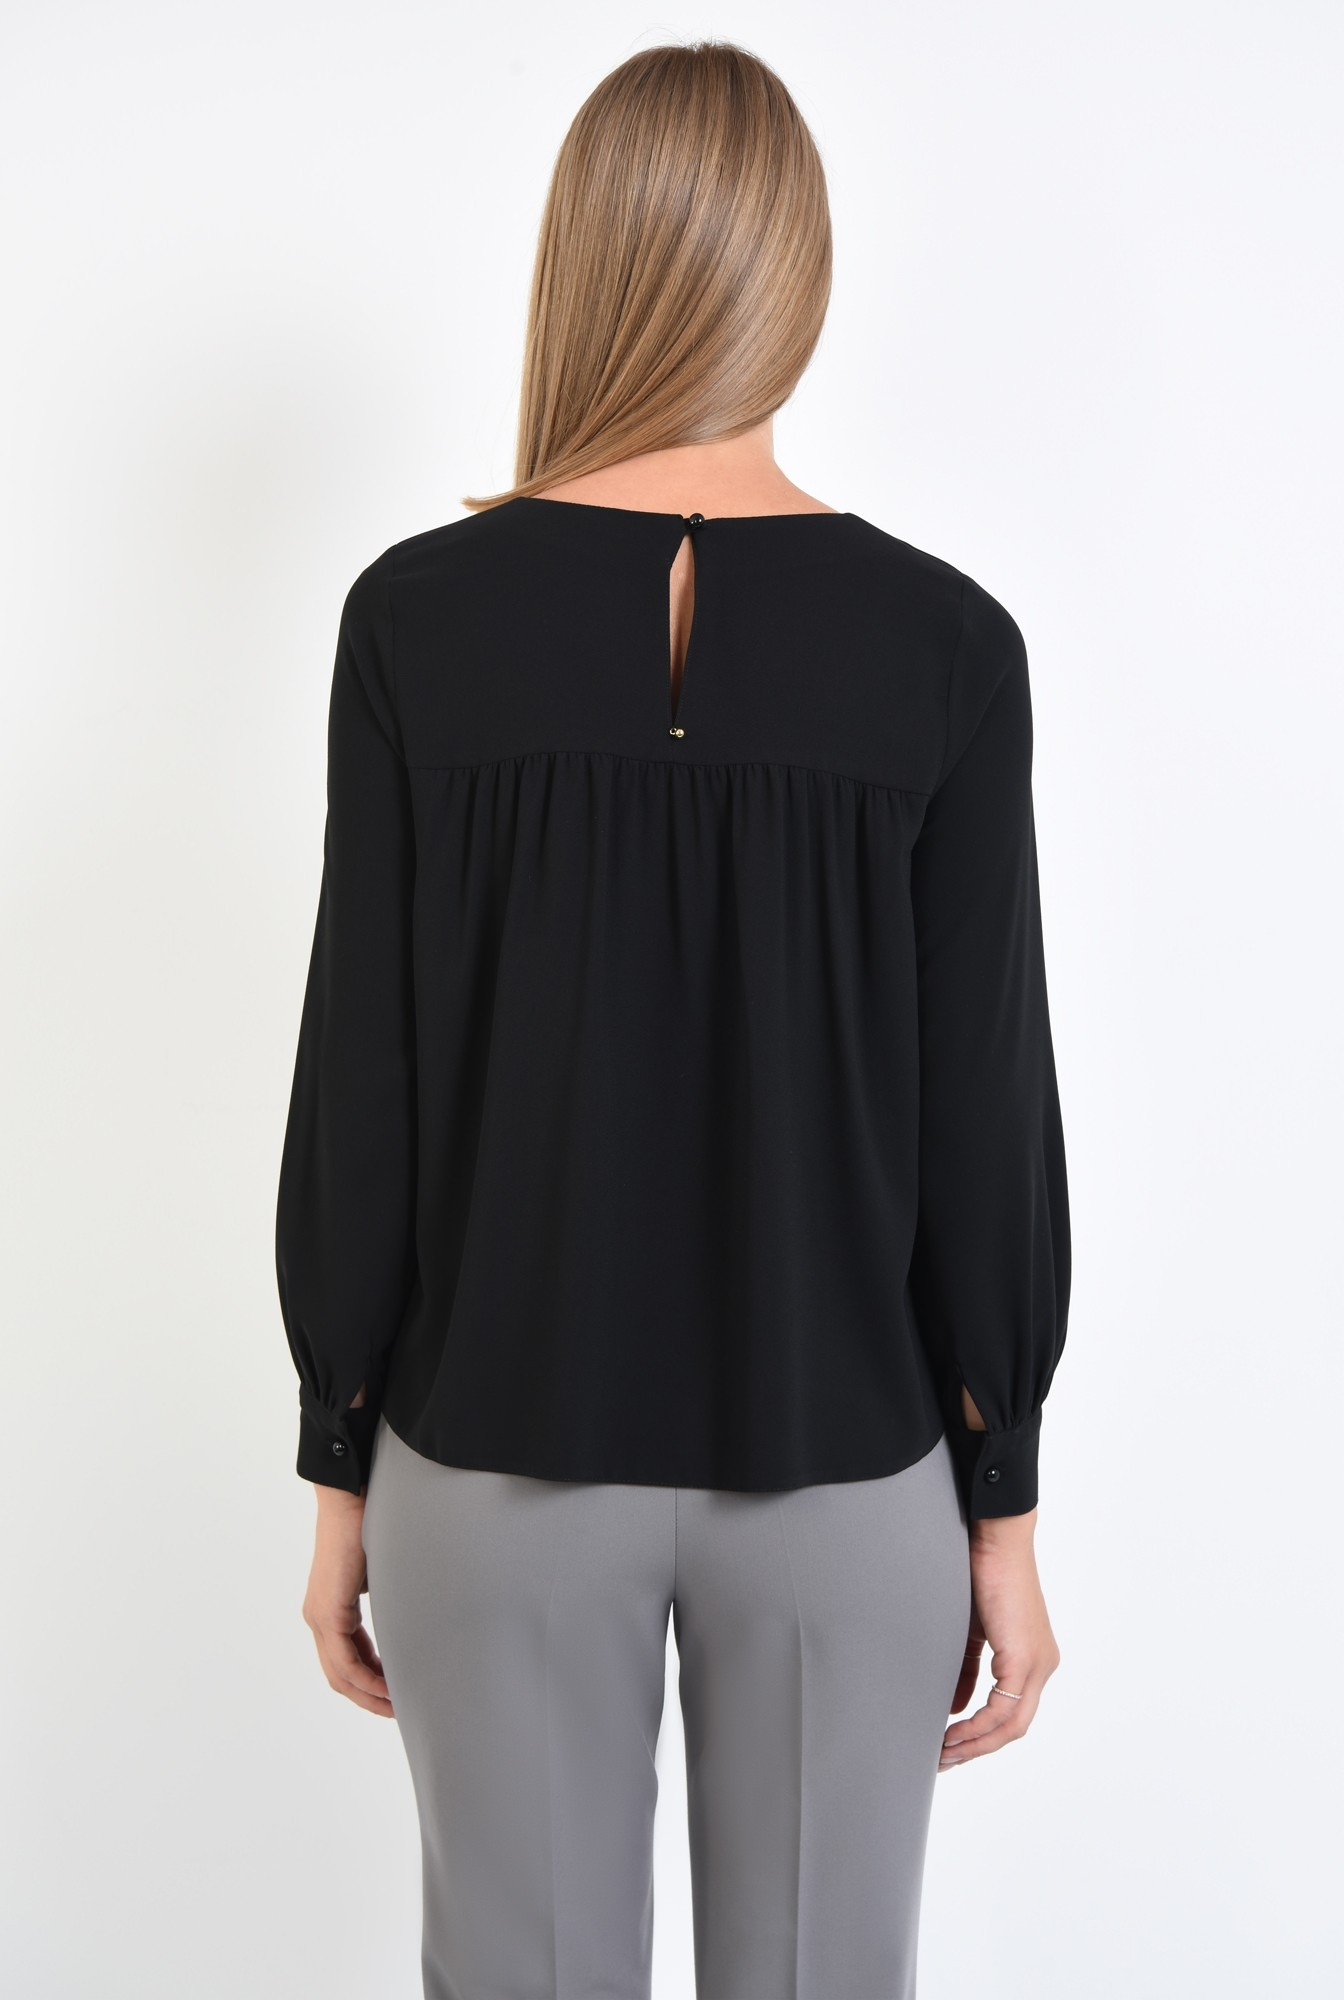 1 - Bluza casual, negru, croi lejer, funda la gat